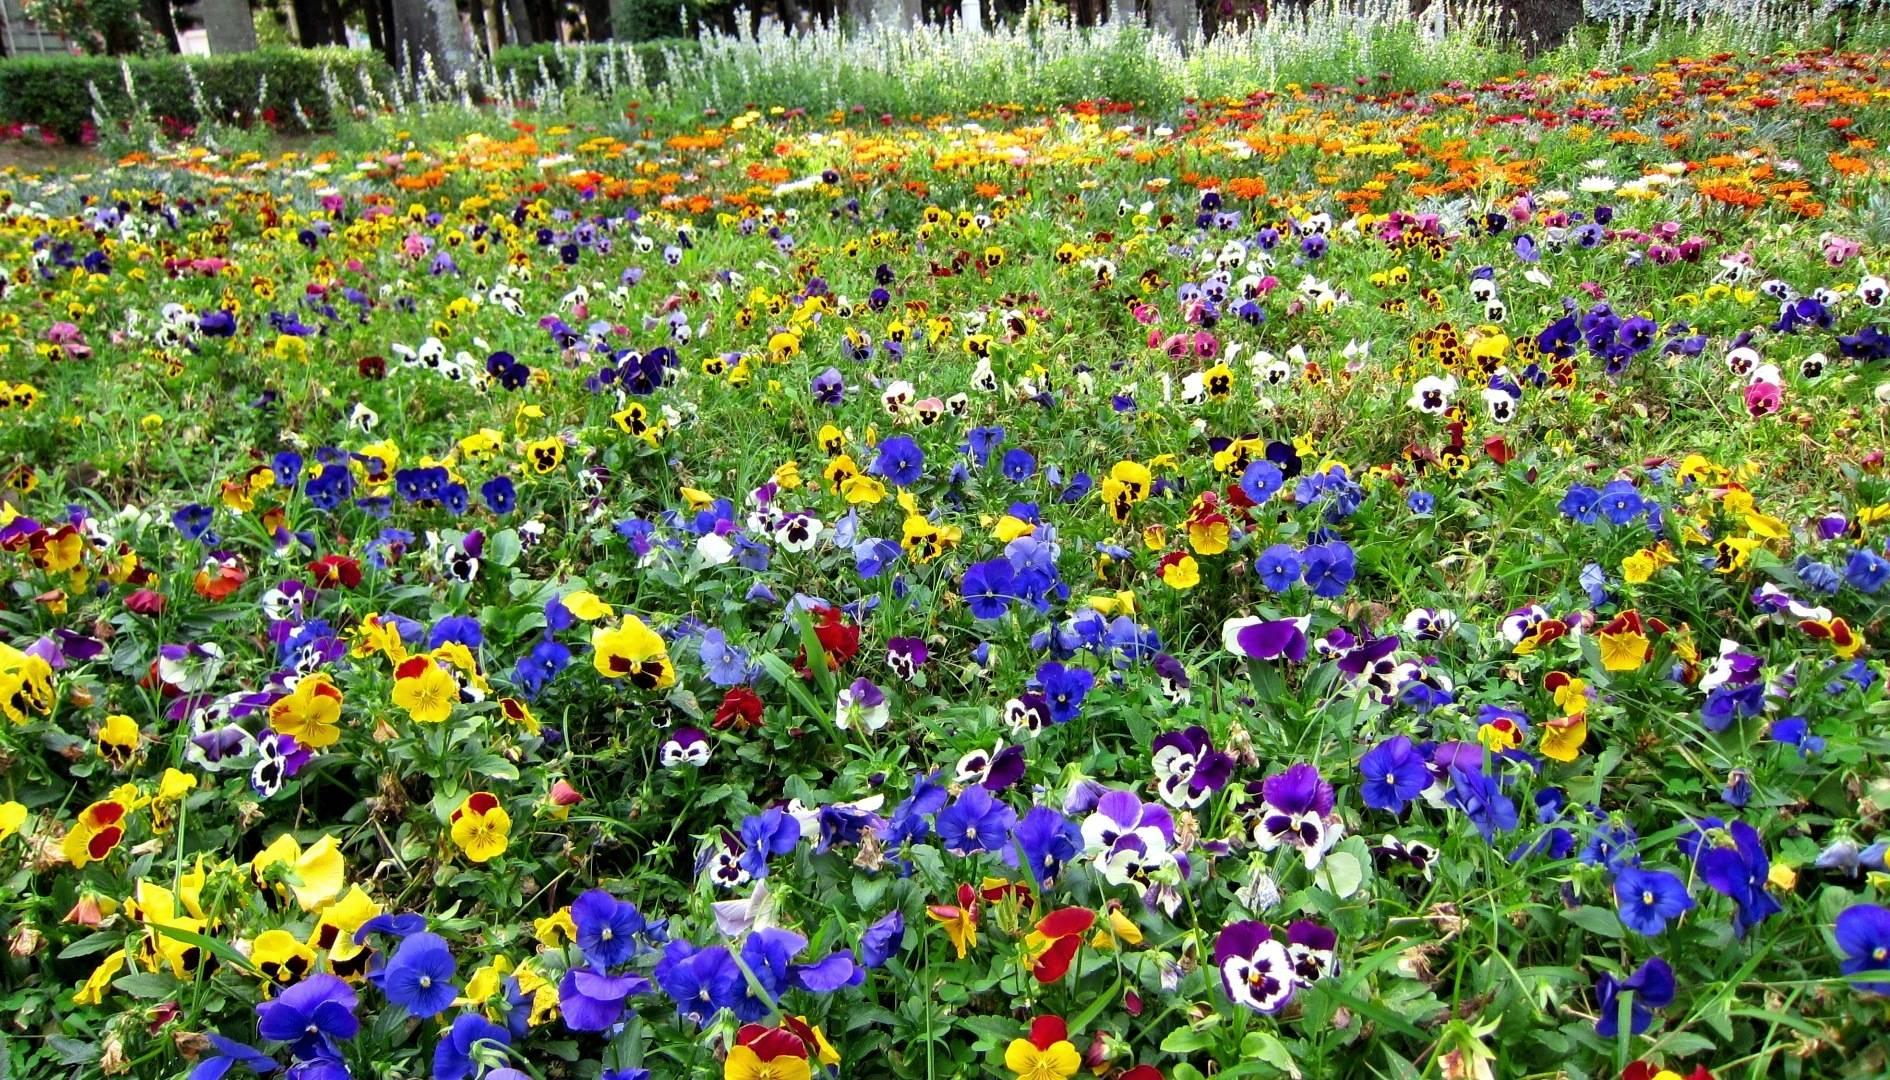 Wallpaper download garden - Hd Beautiful Garden Wallpaper Download Free 67095